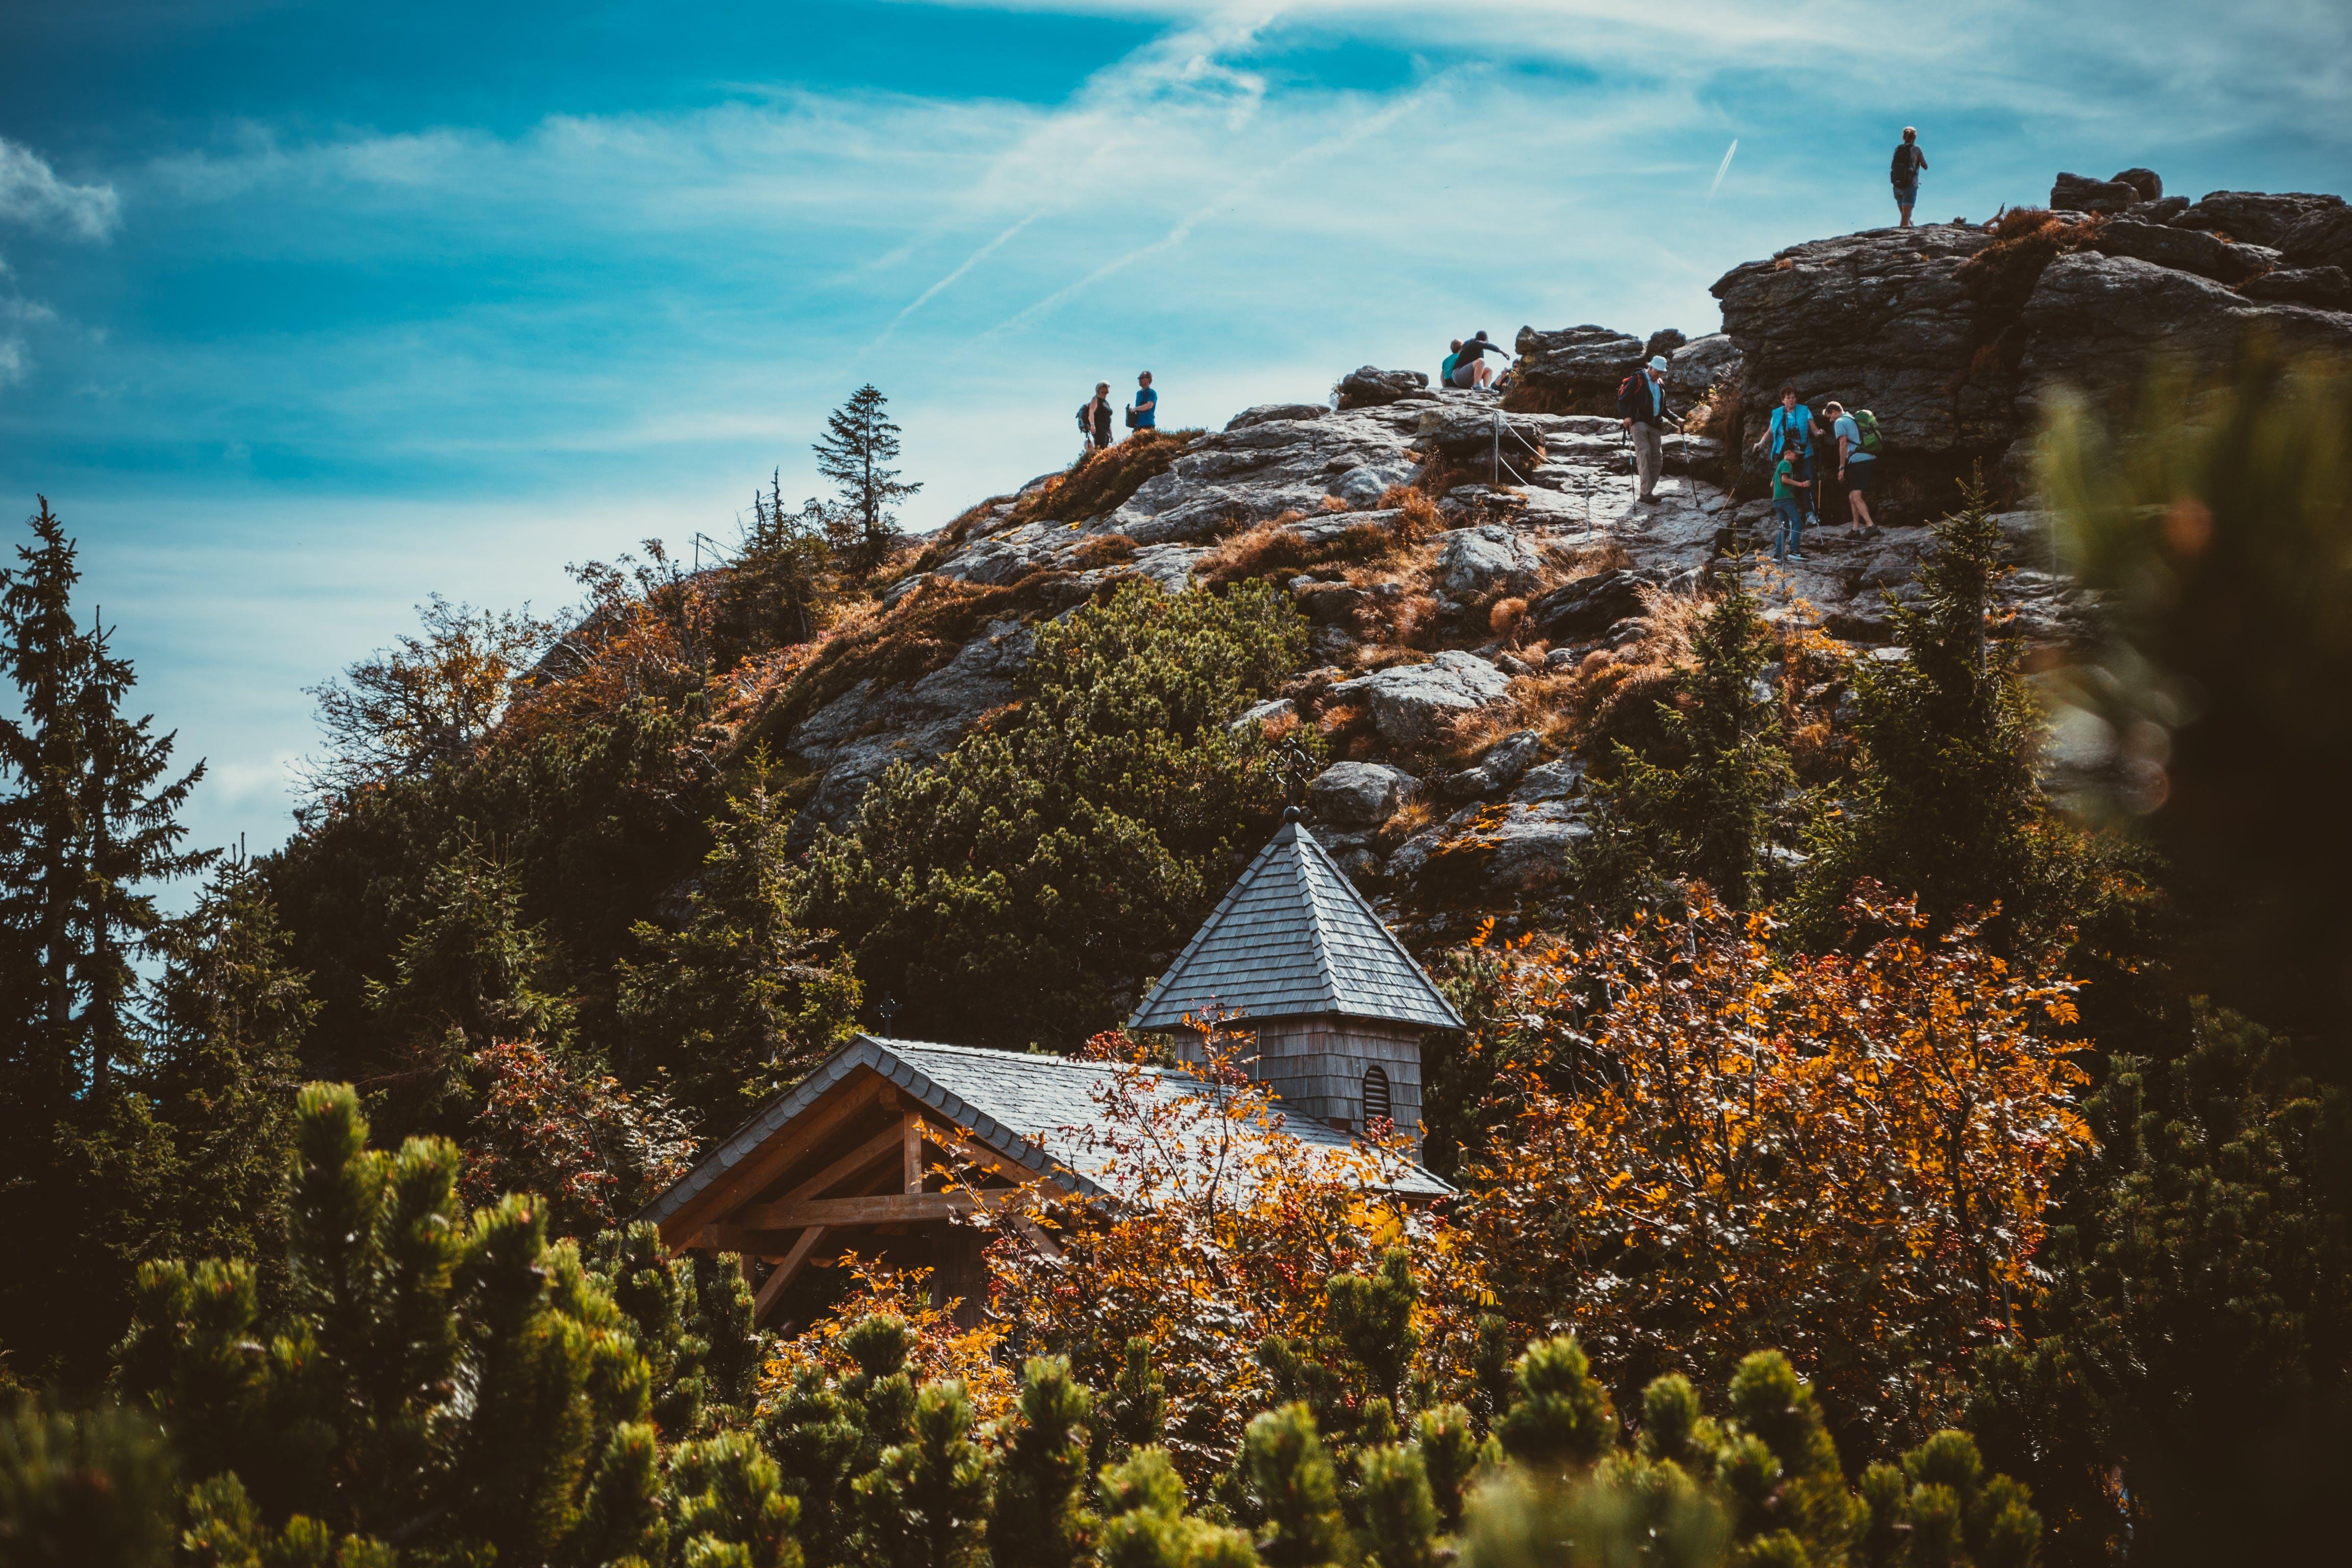 Kostenloses Stock Foto zu bäume, berg, felswand, gras